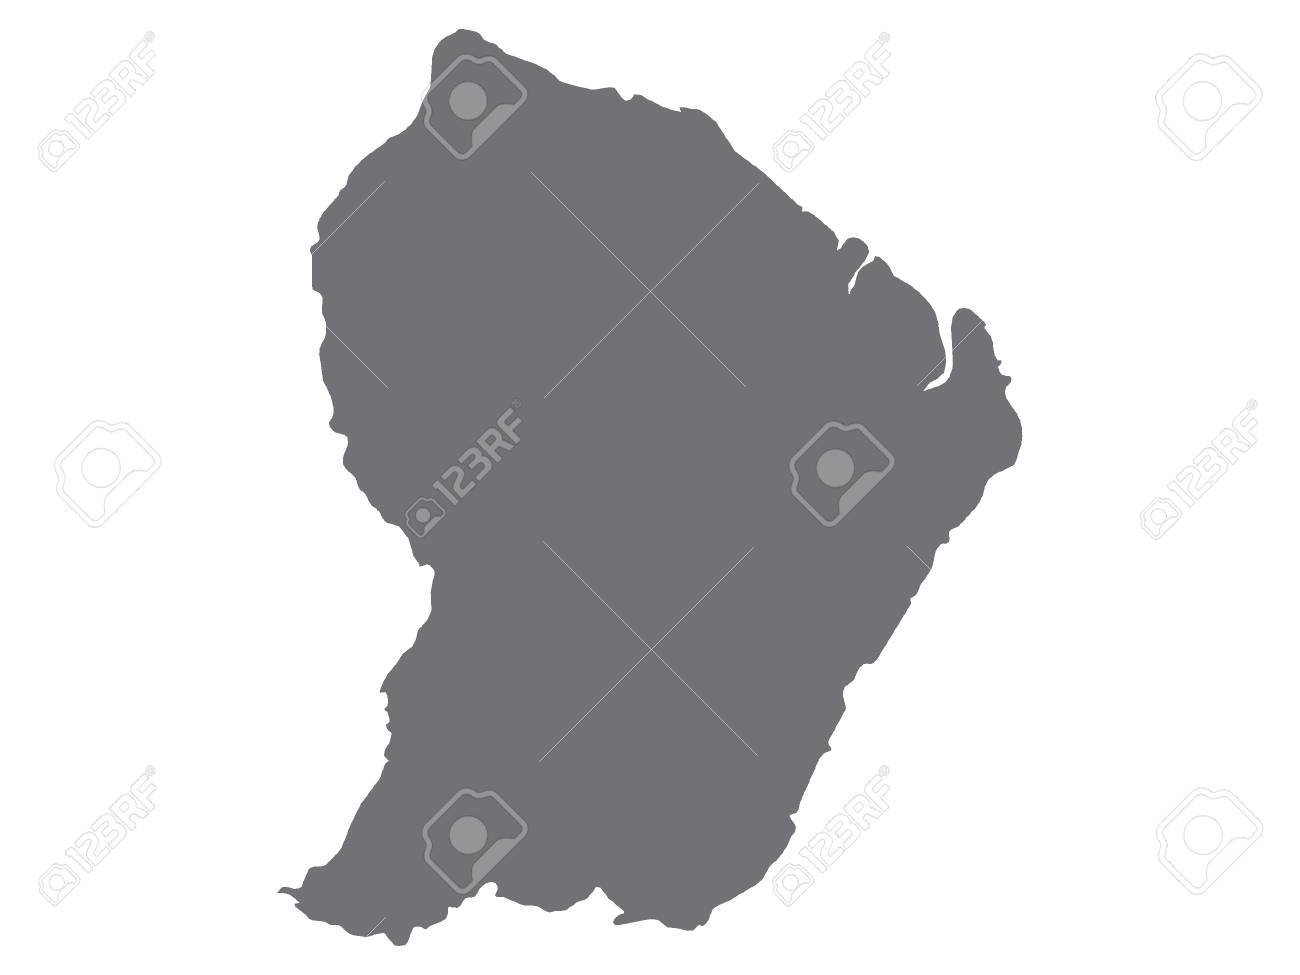 Gray Map of French Guiana - 111564593